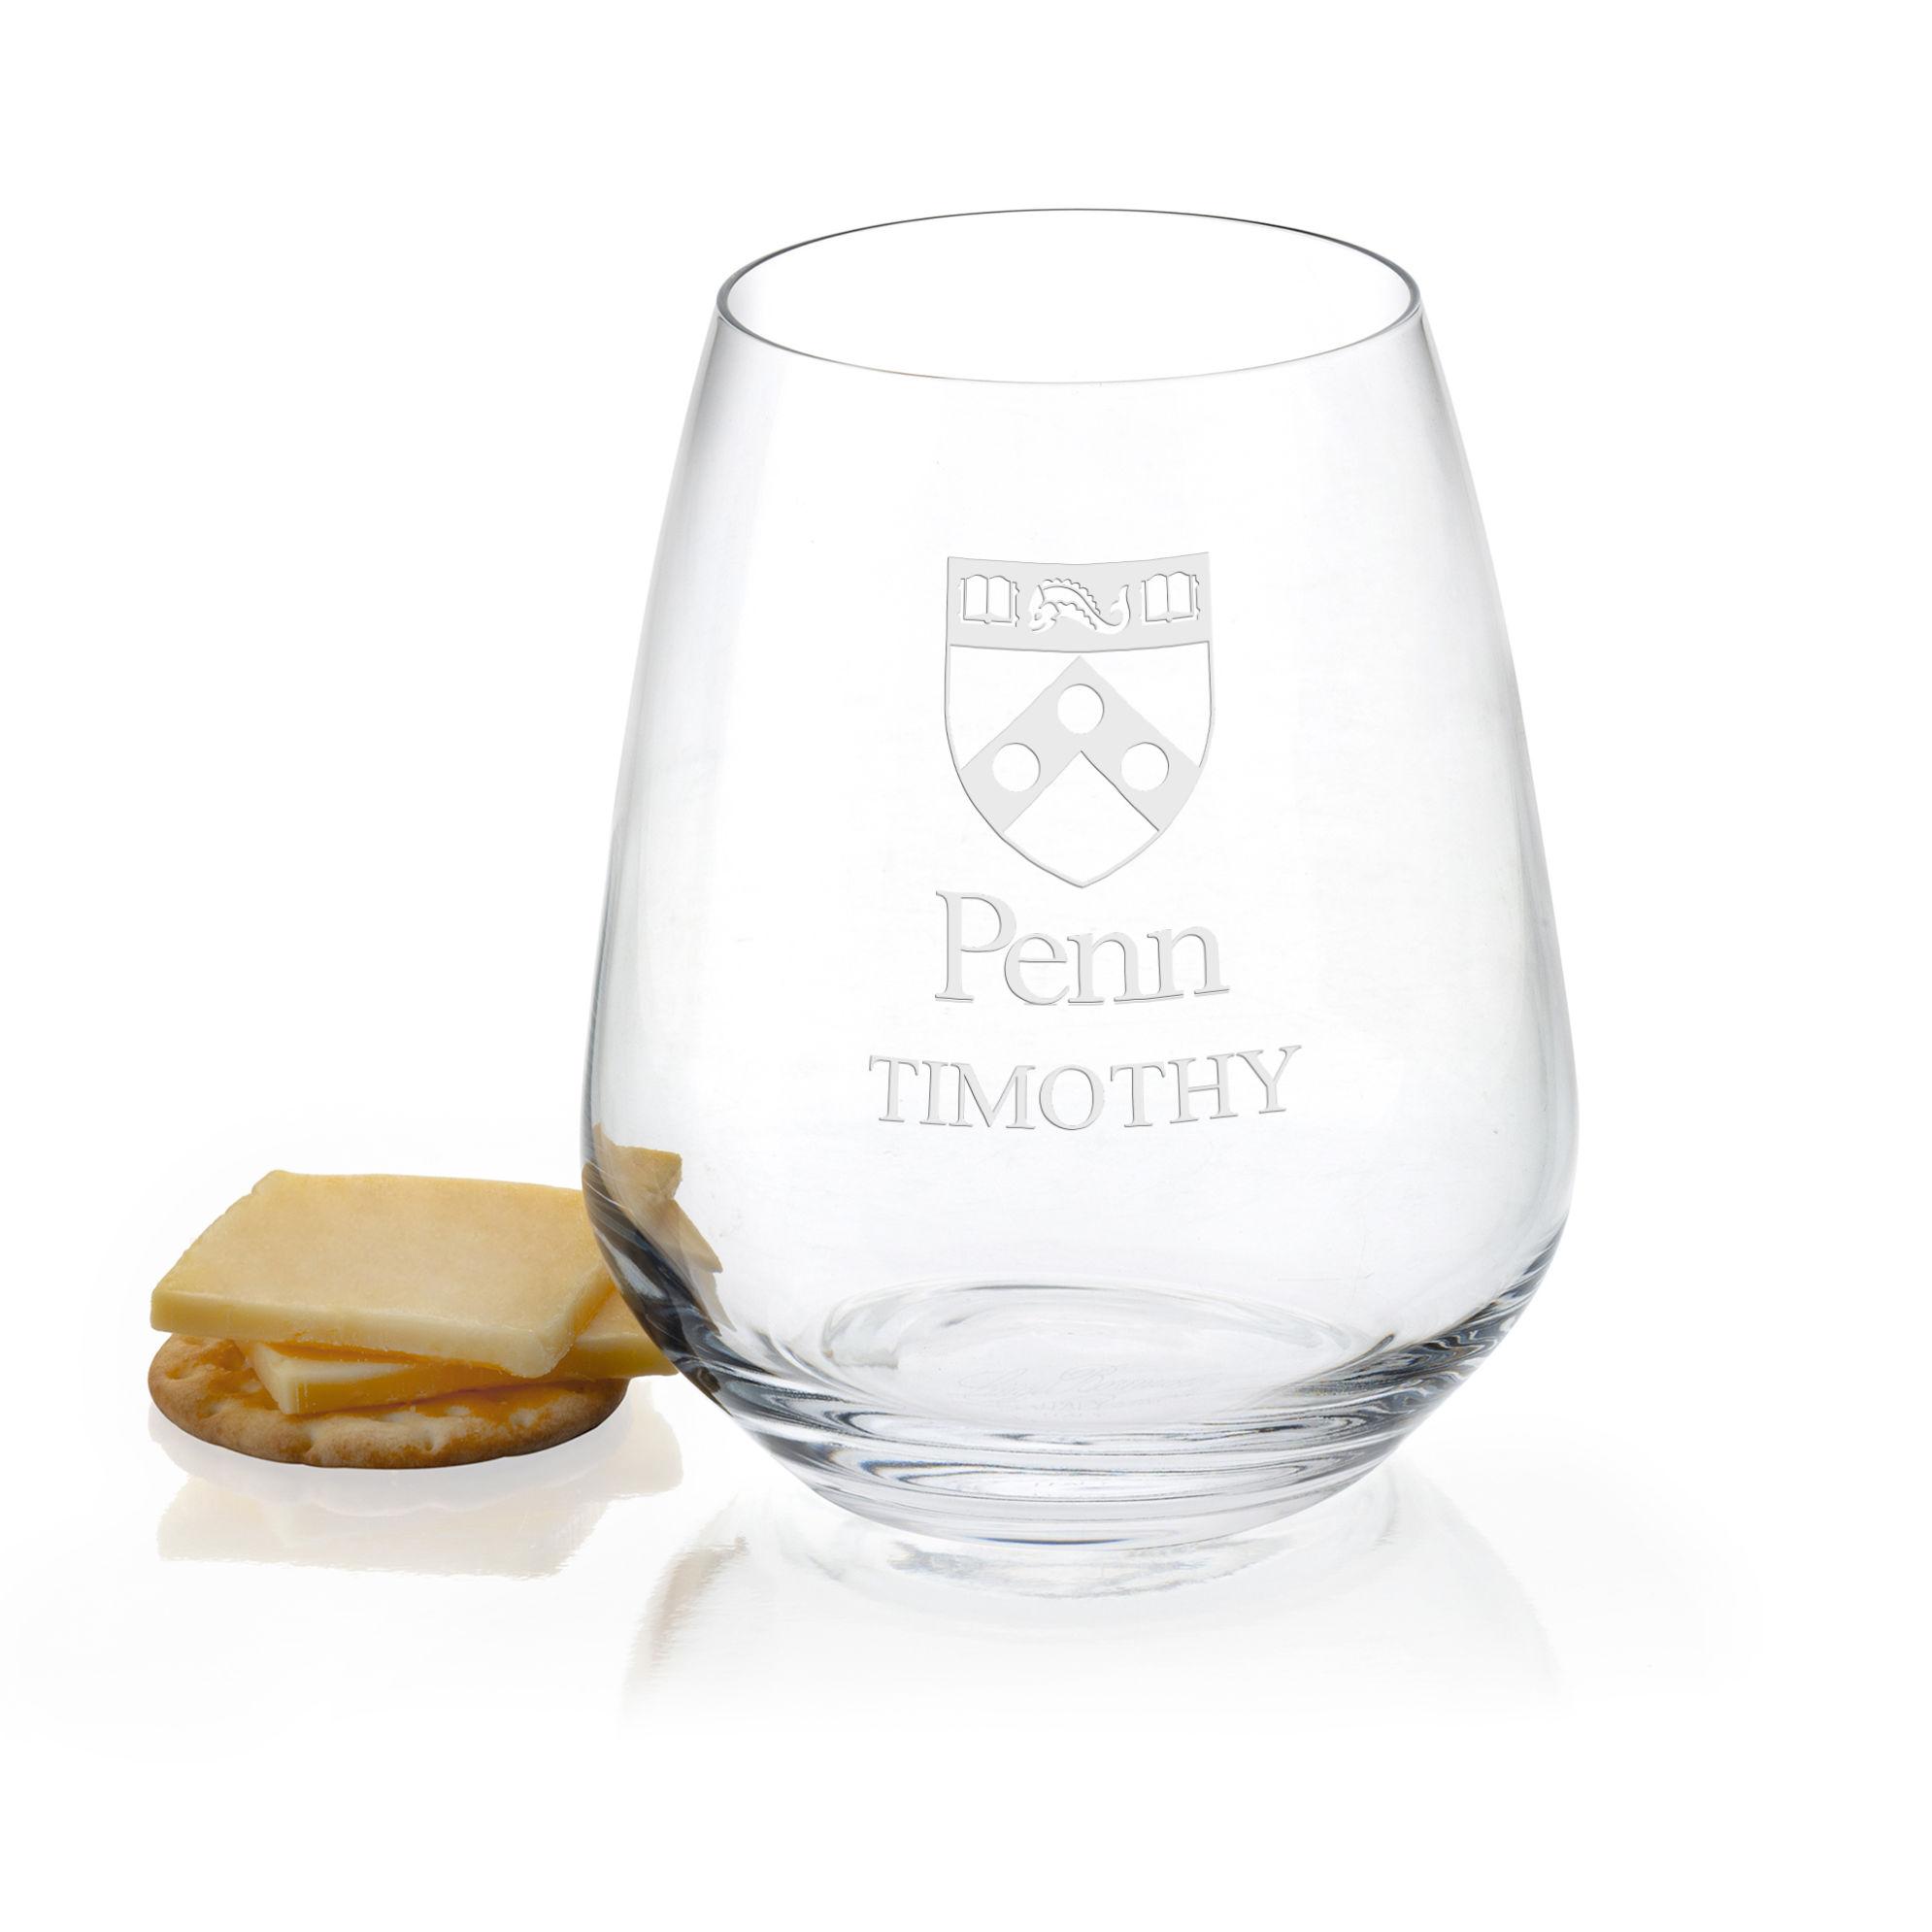 University of Pennsylvania Stemless Wine Glasses - Set of 2